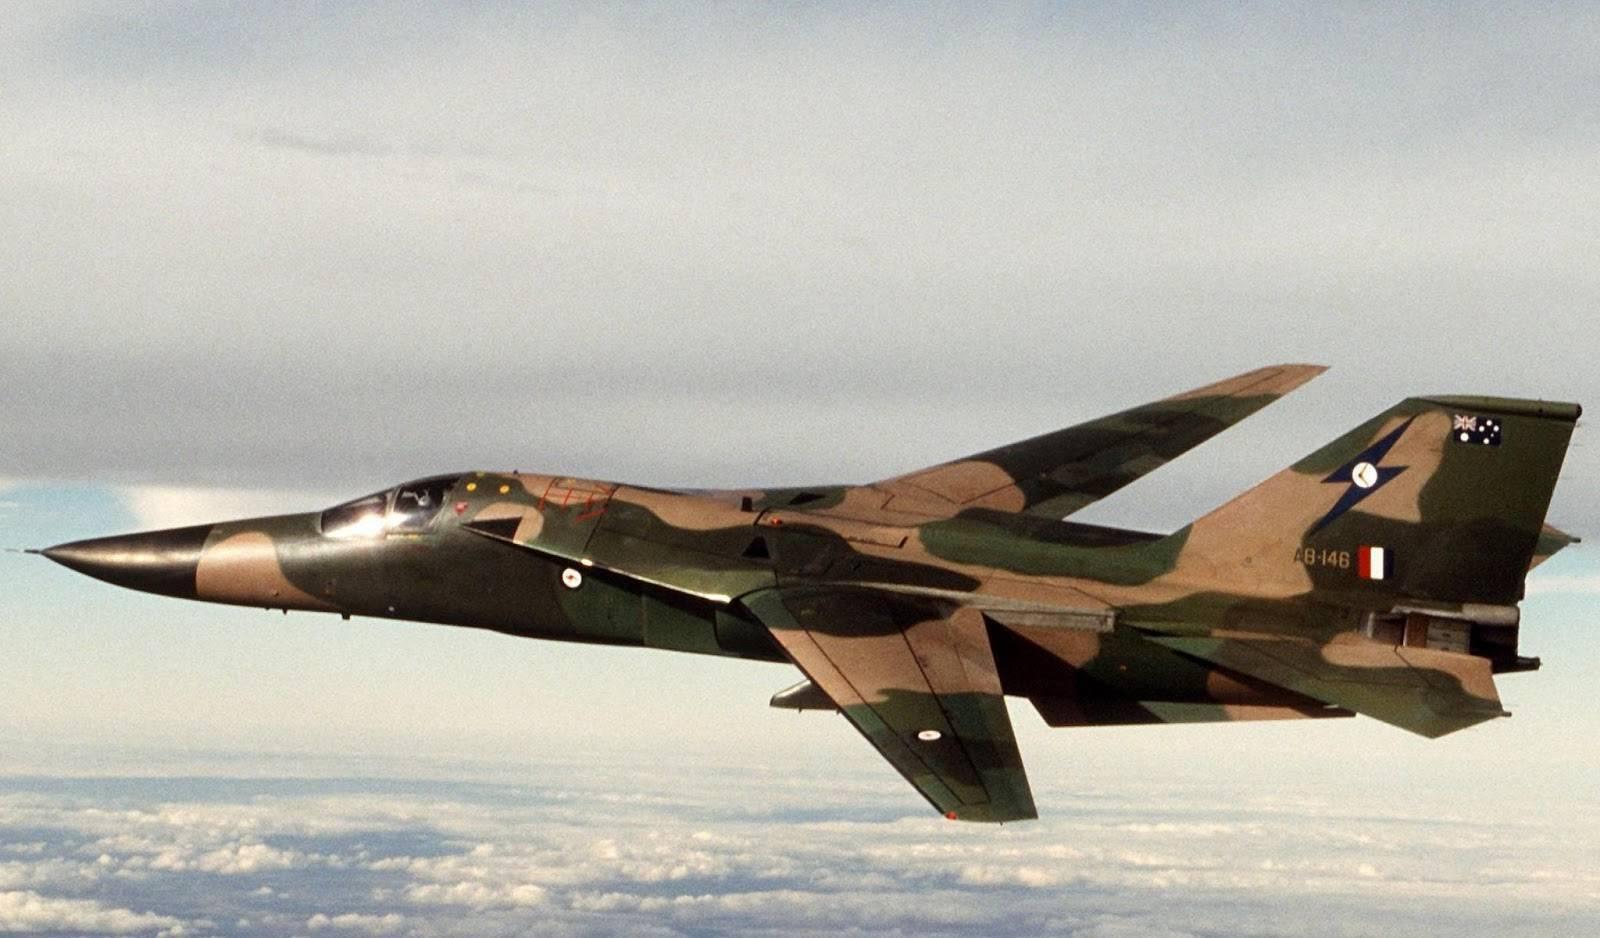 General dynamics f-111c - general dynamics f-111c